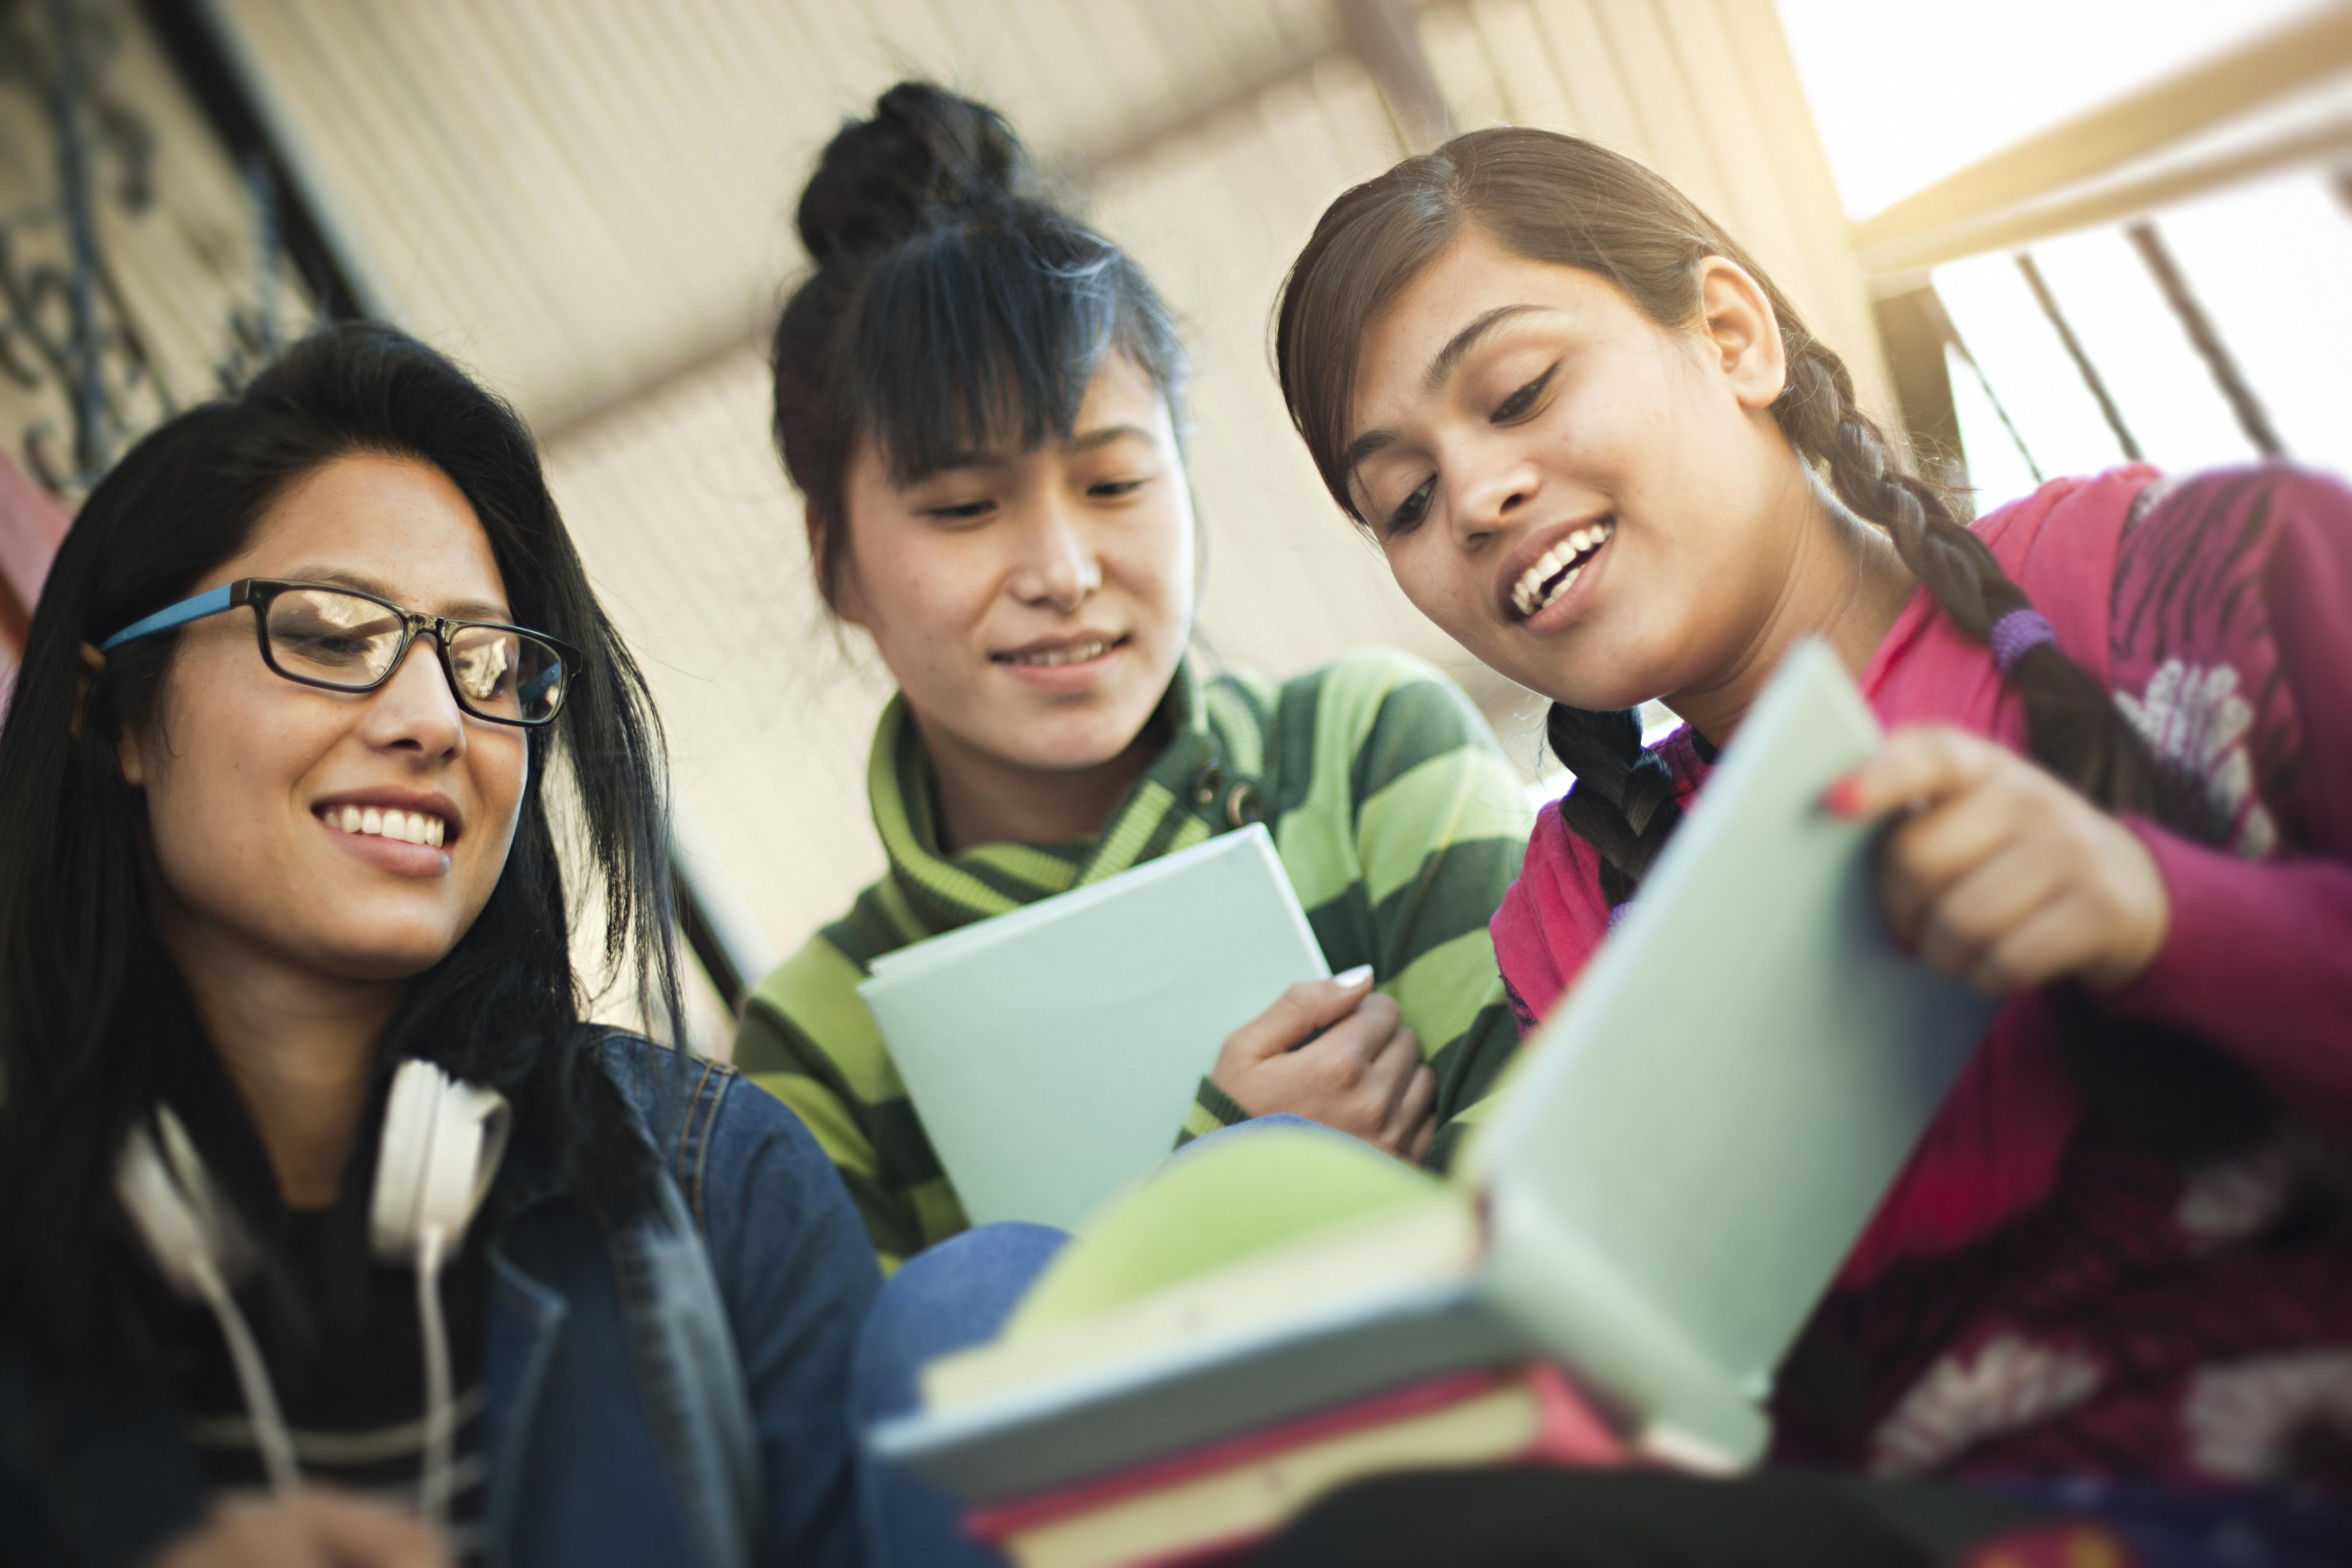 Three girls reading a book